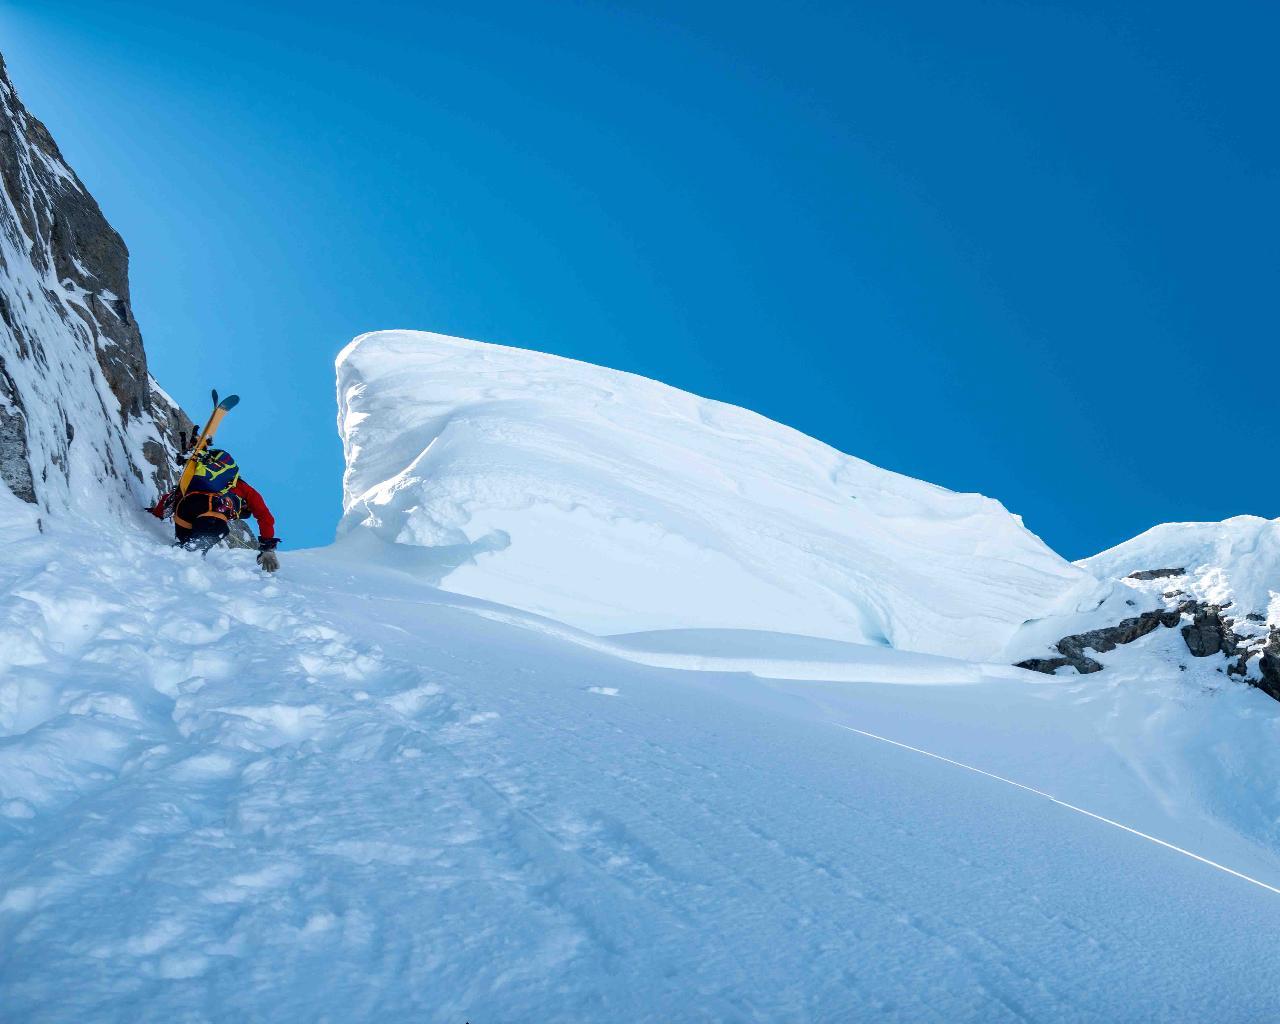 Private - Ski Mountaineering Course